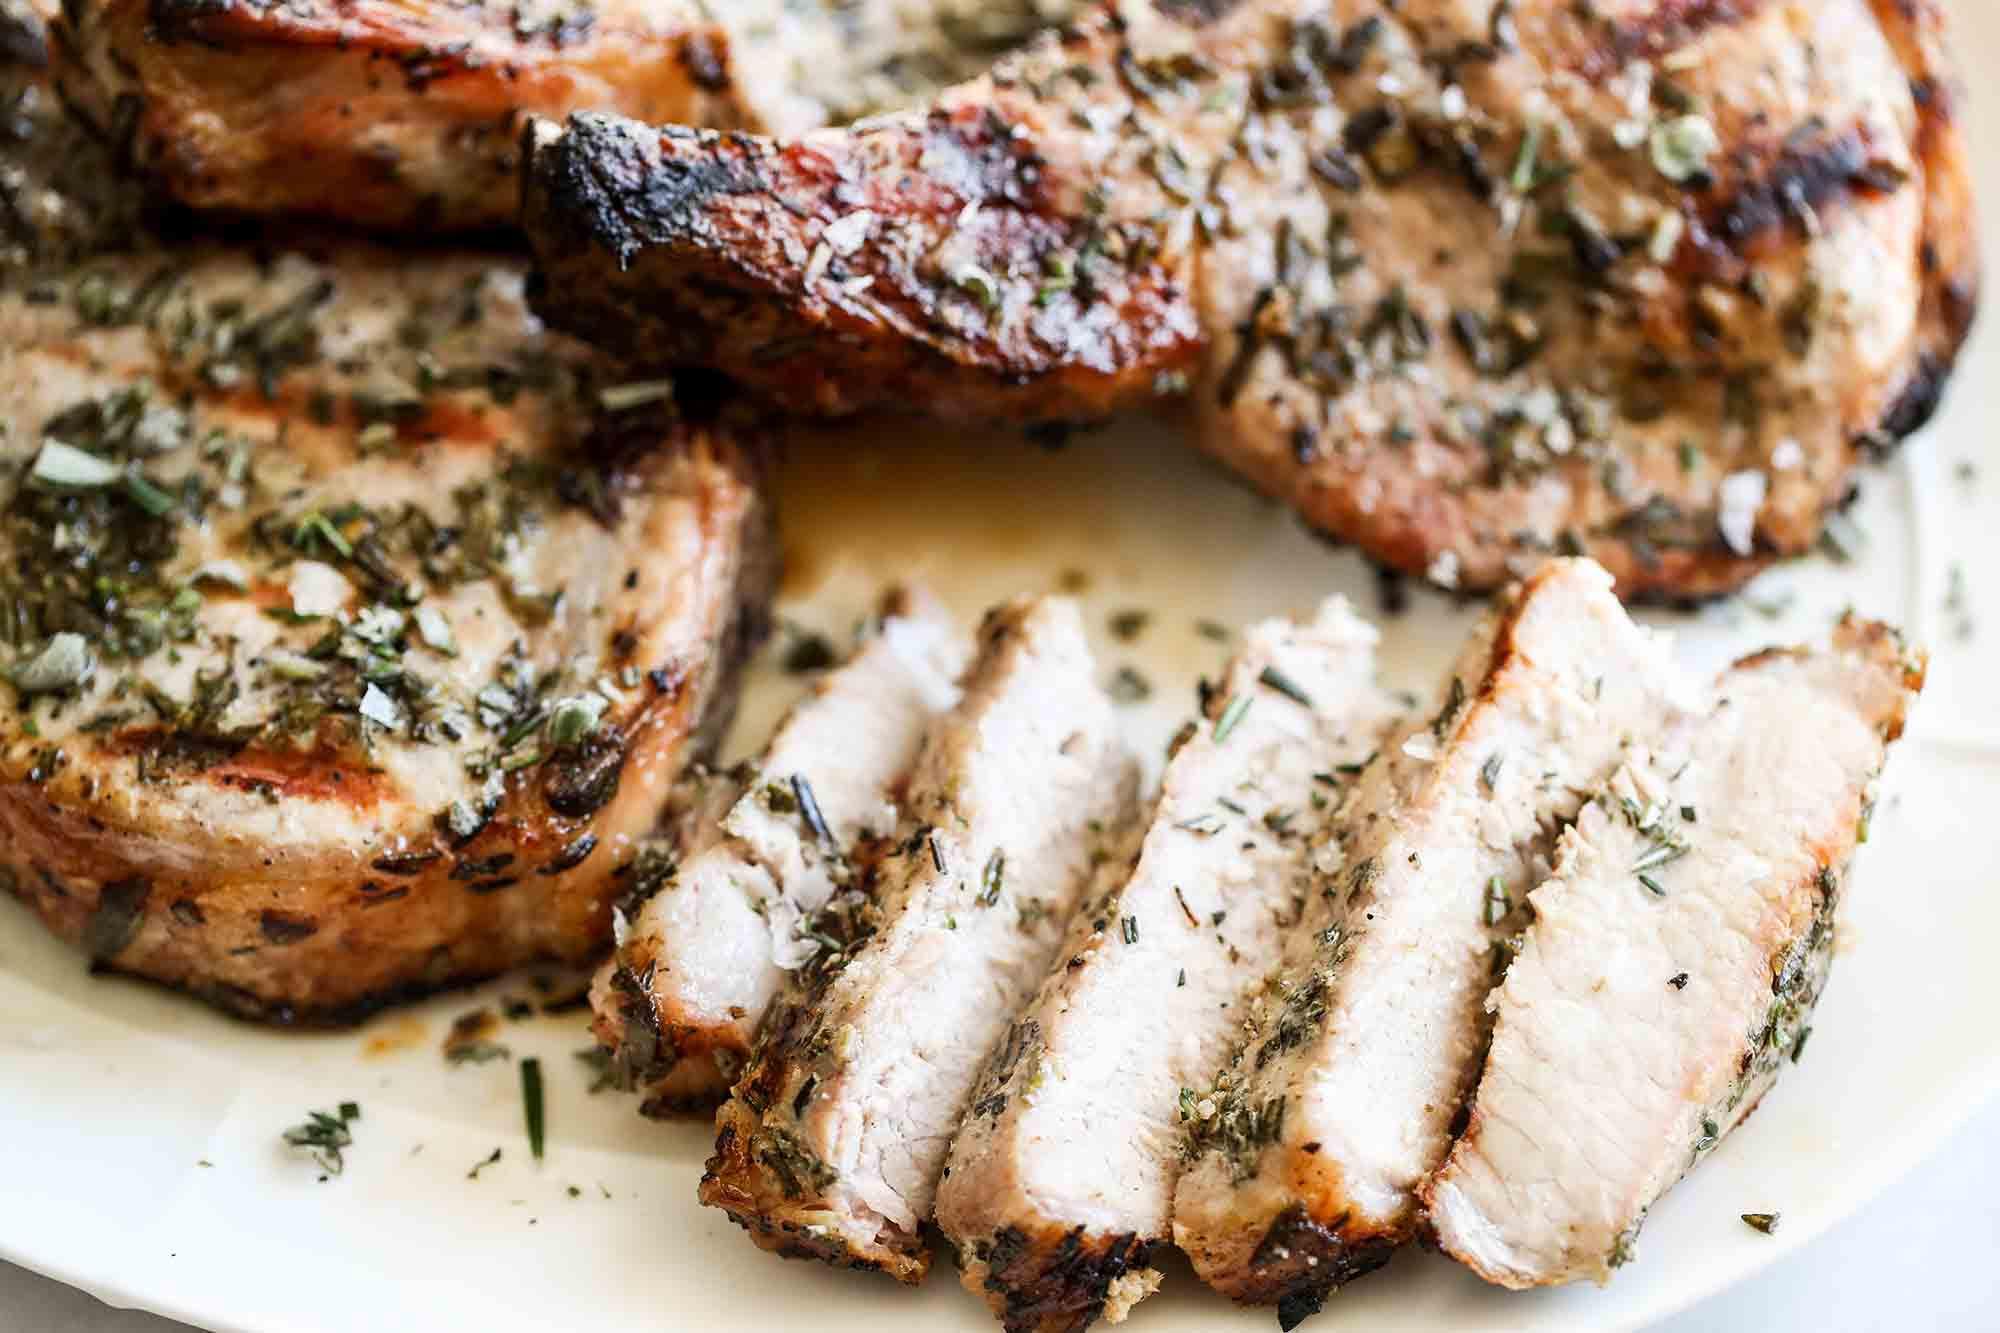 Sous Vide Frozen Pork Chops  How to Cook Pork Chops Sous Vide